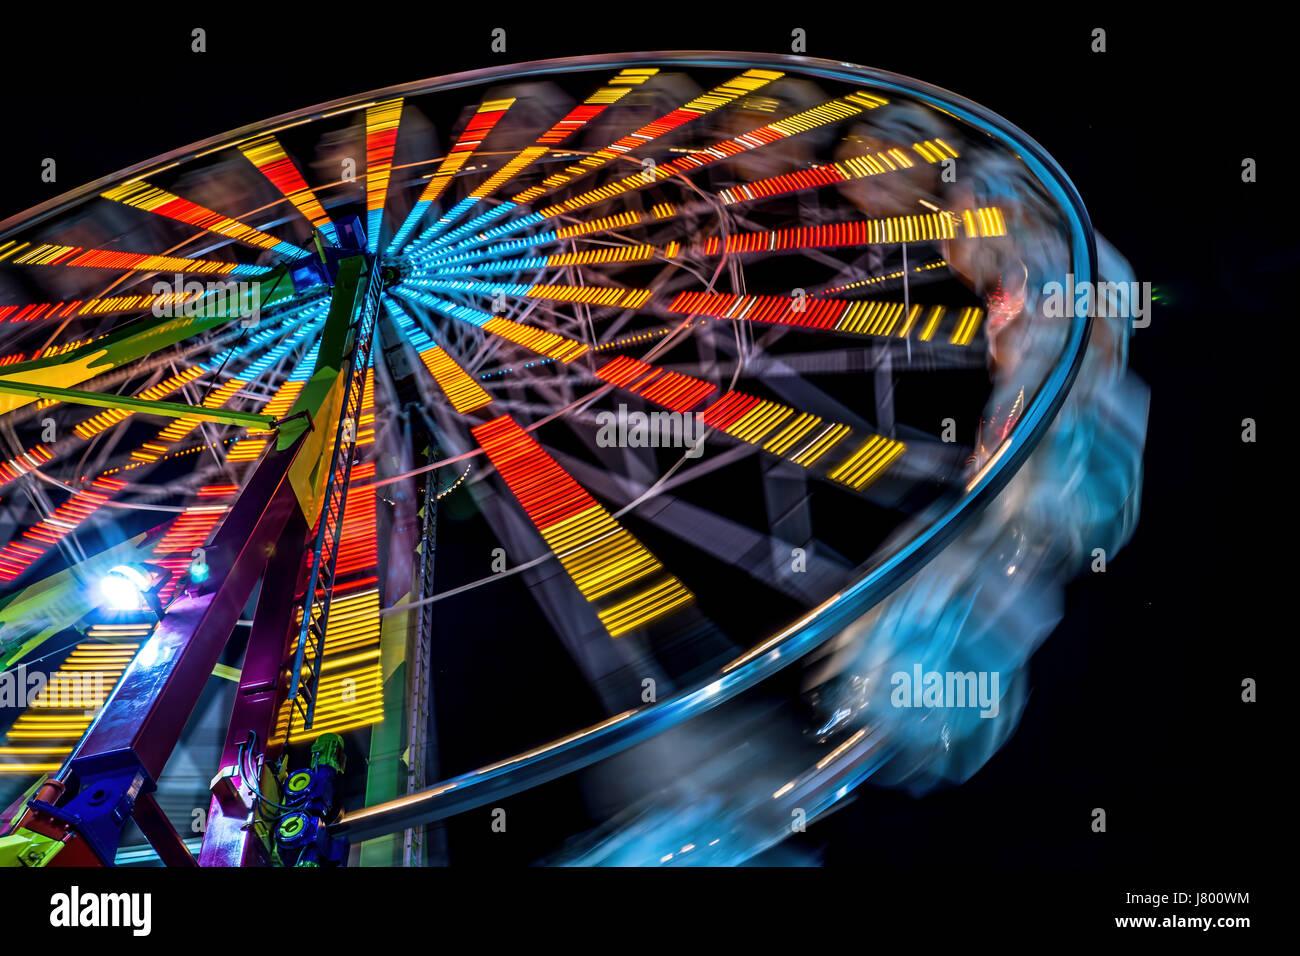 Midway Rides Ferris Wheel Stock Photos Amp Midway Rides